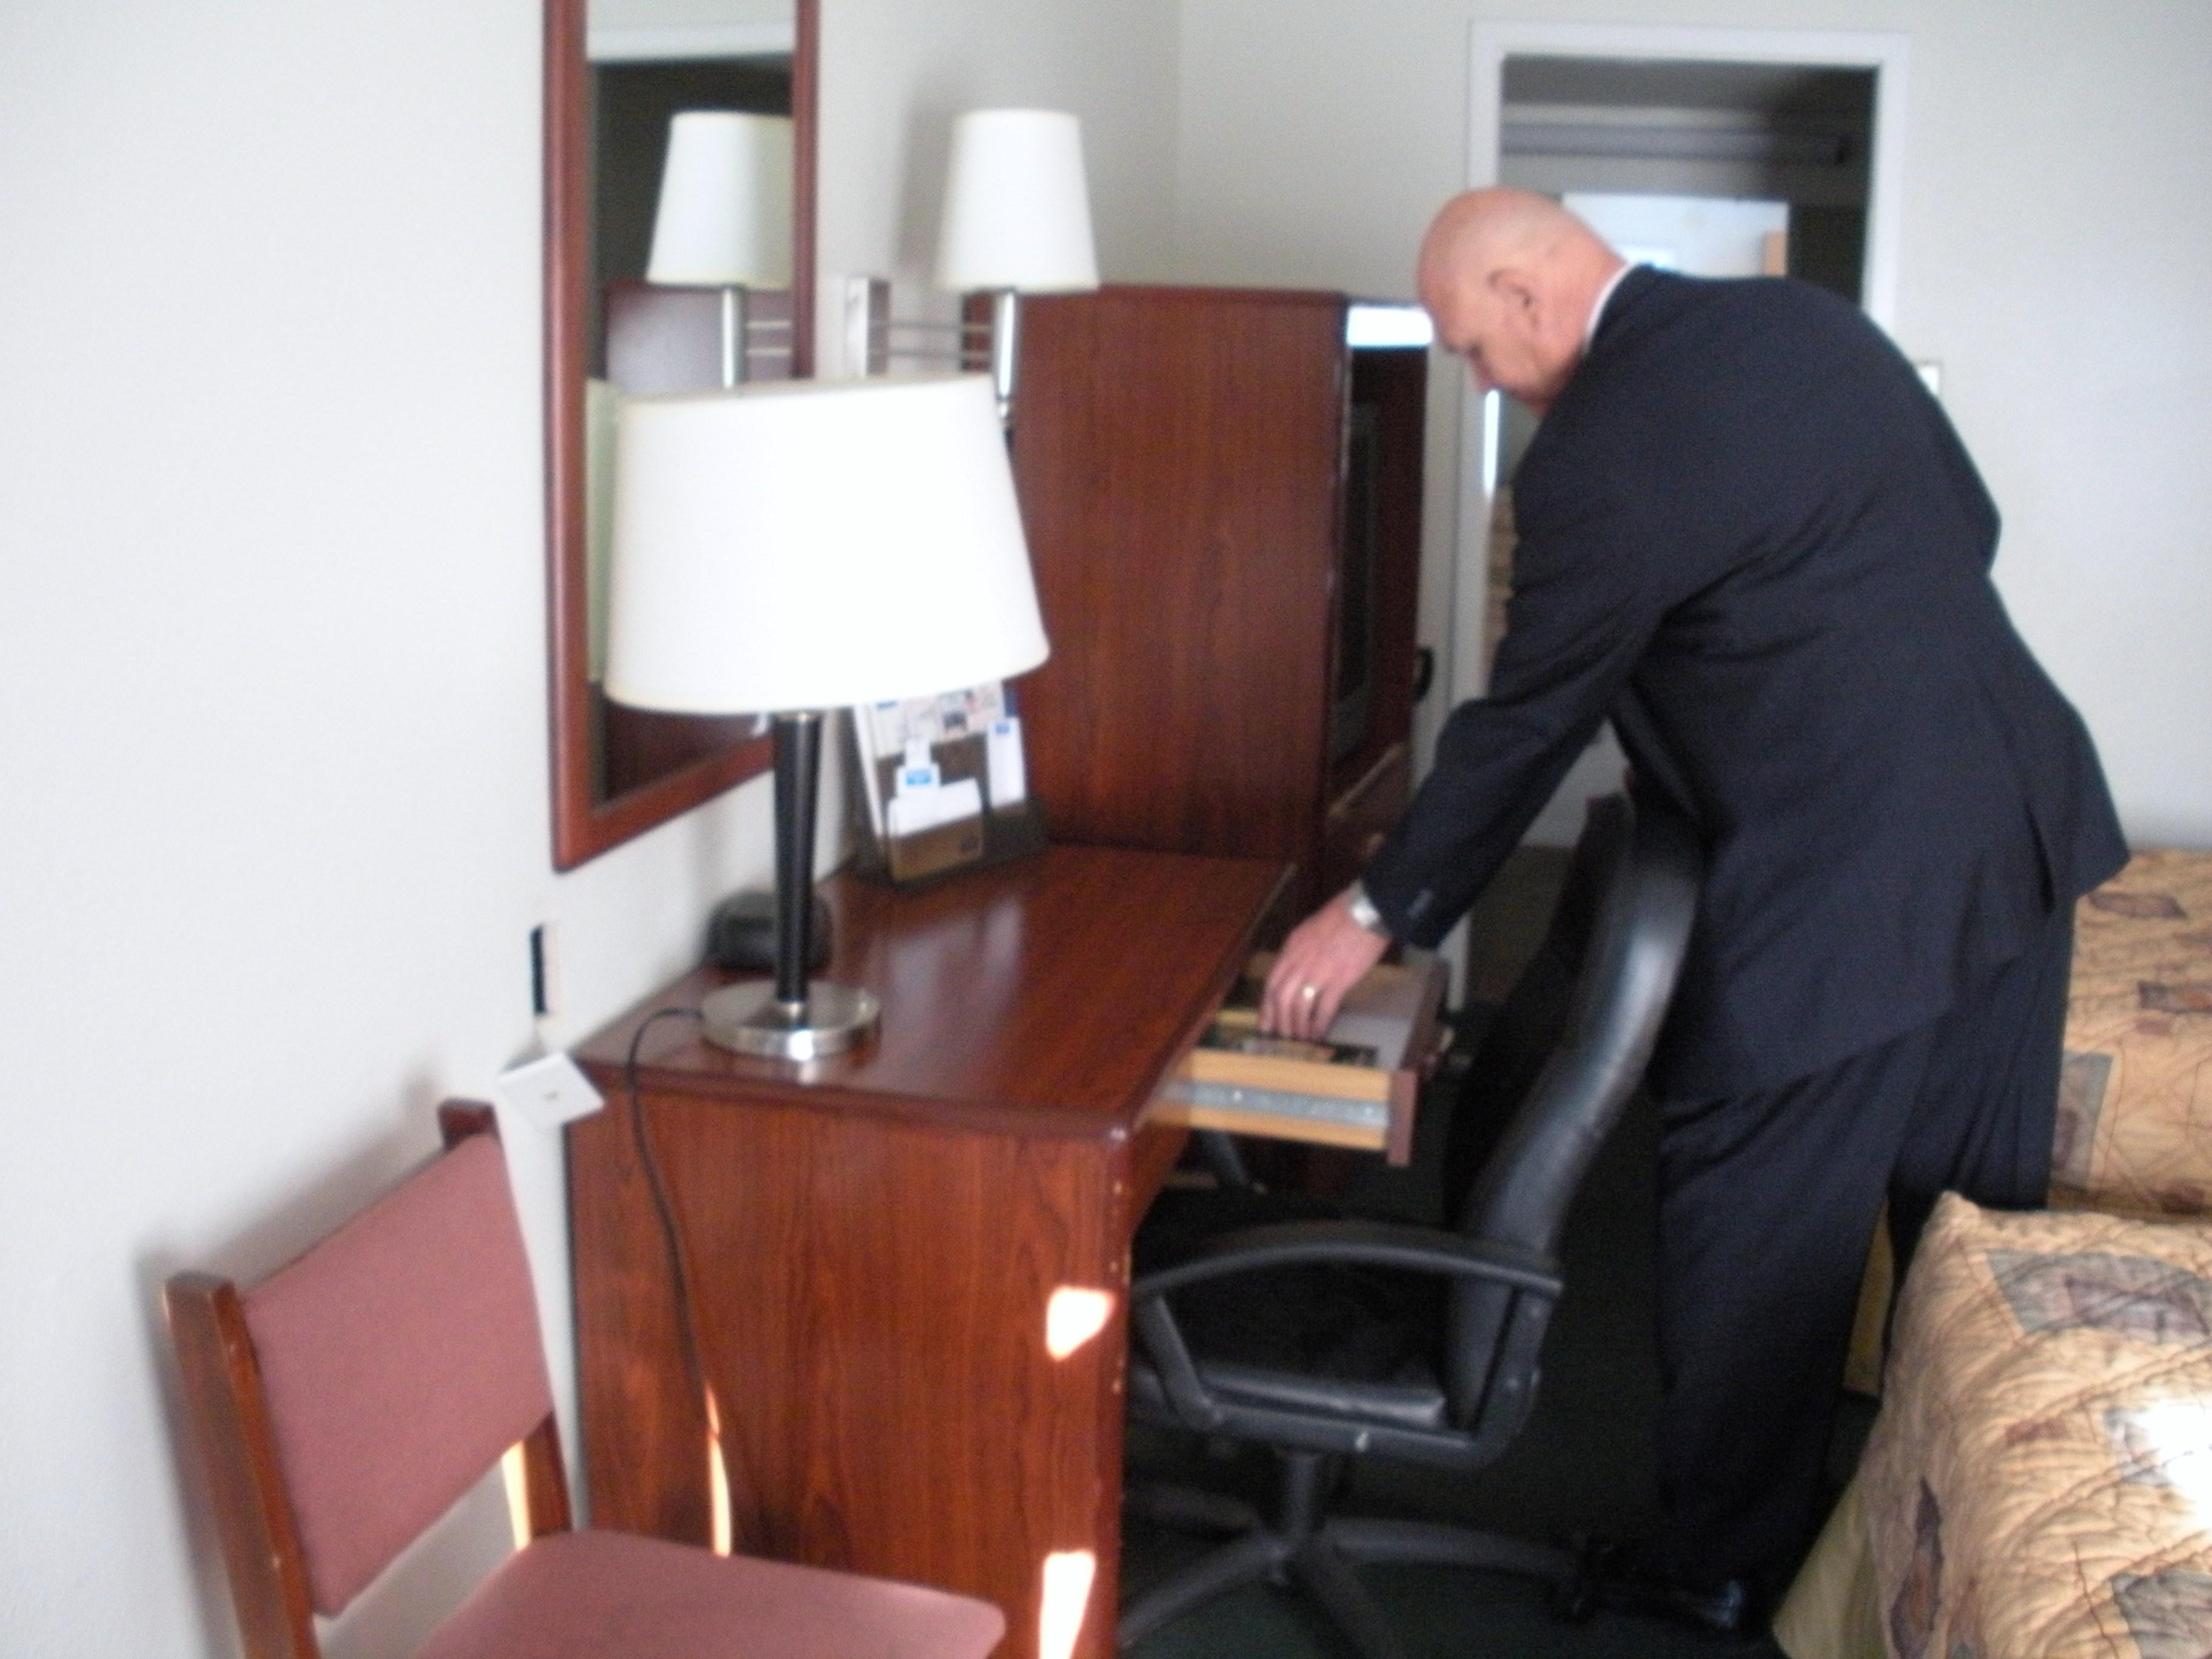 Gideon member distributing scripture in motel room.jpg